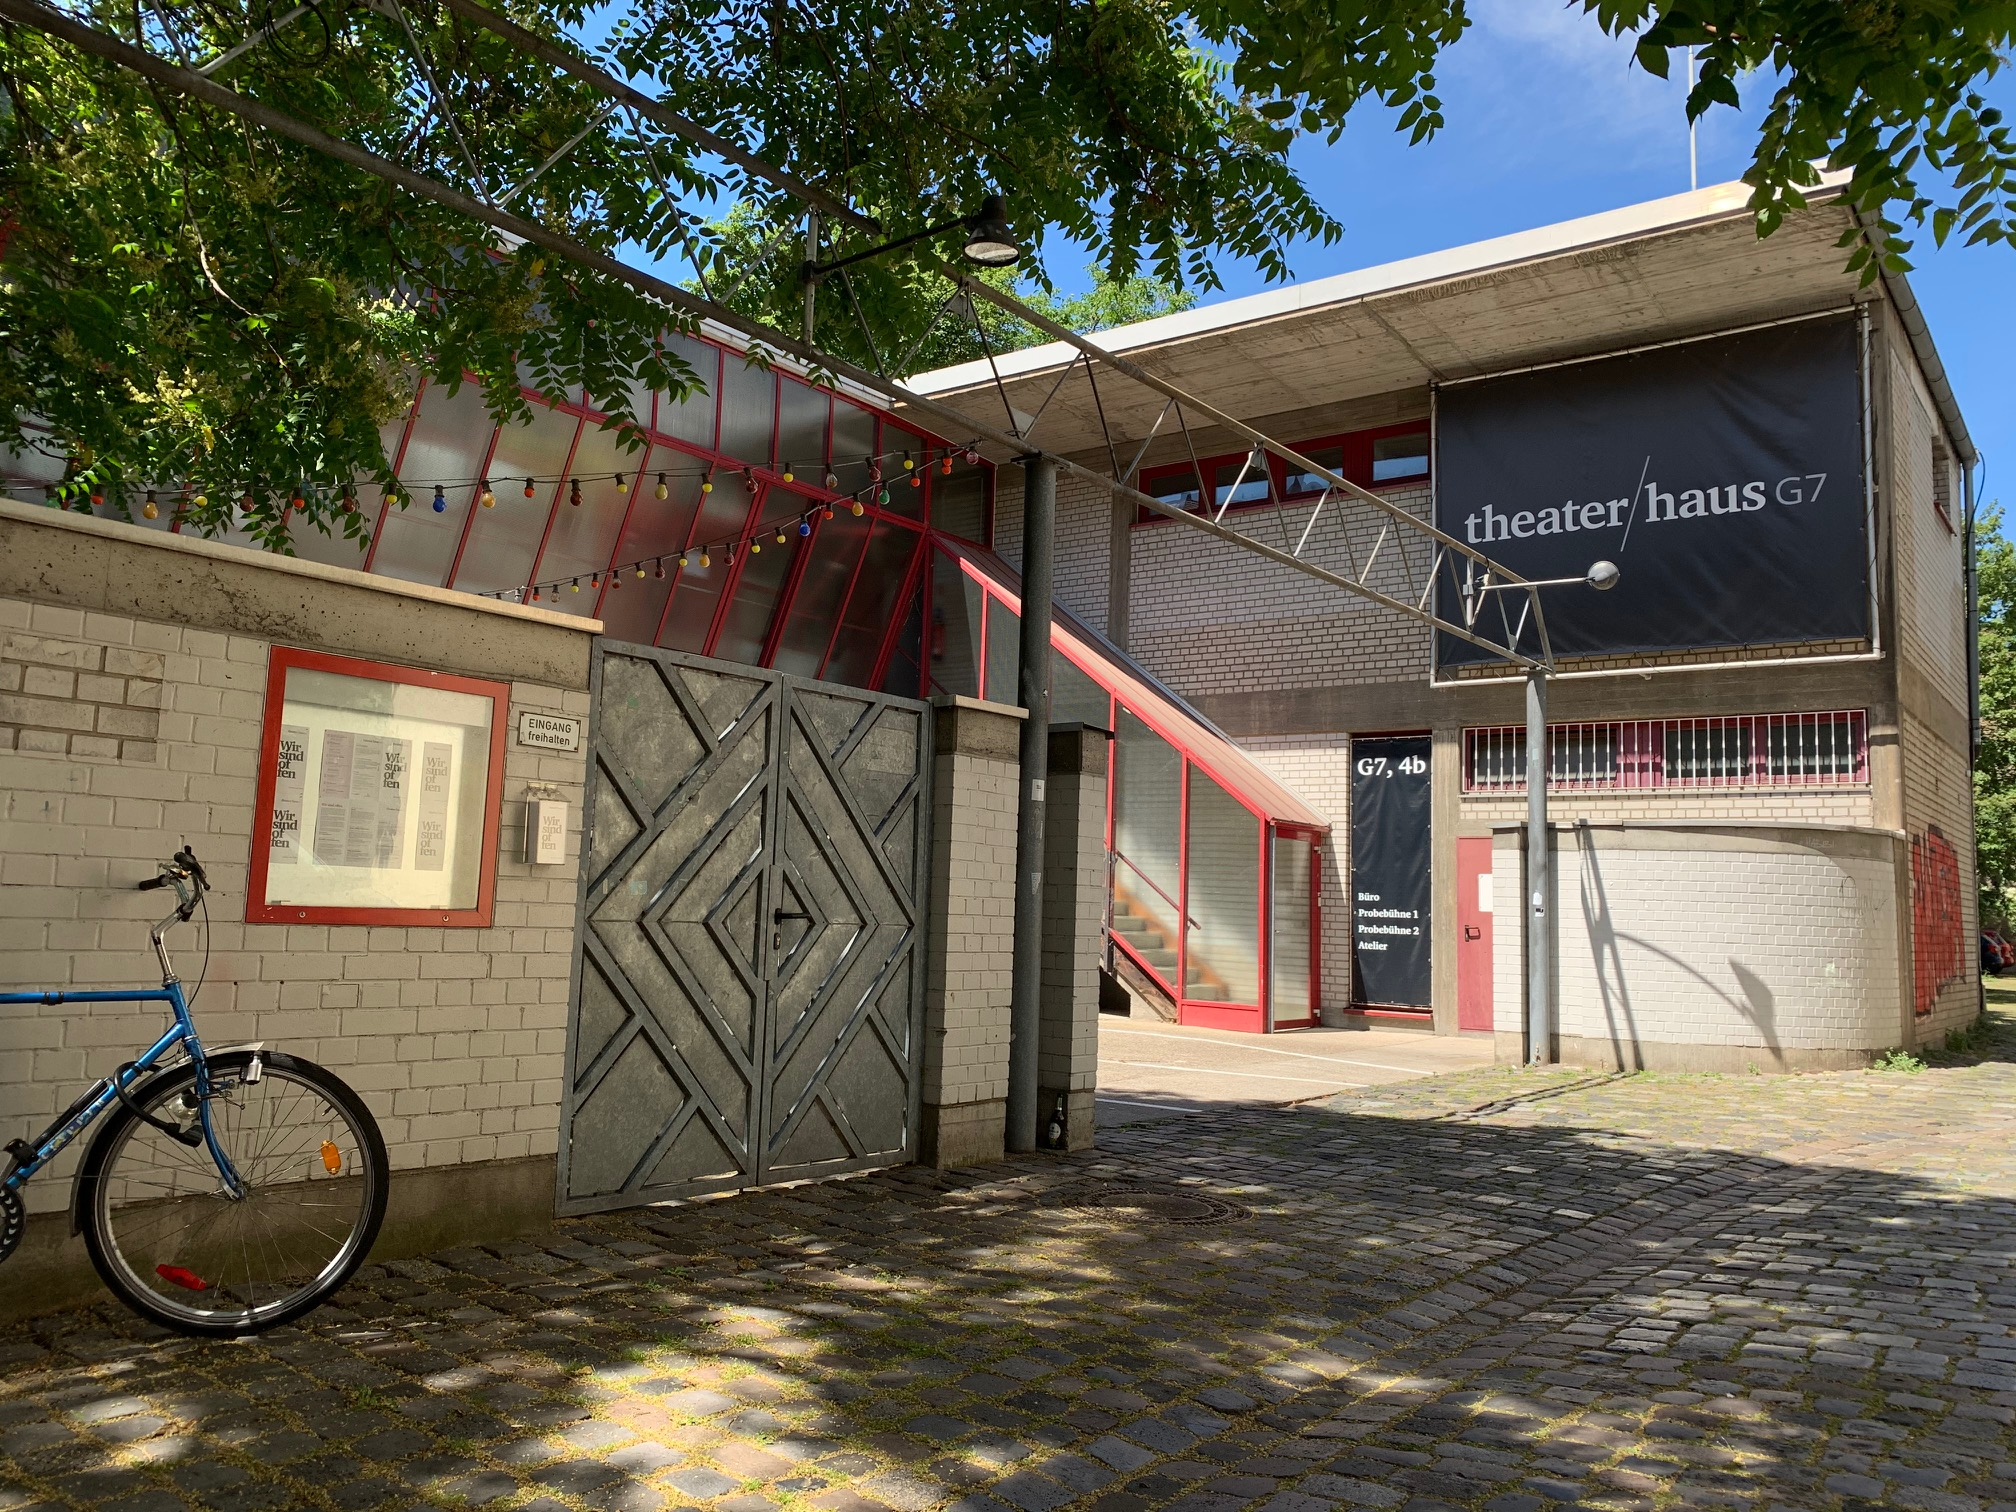 TheaterhausG7